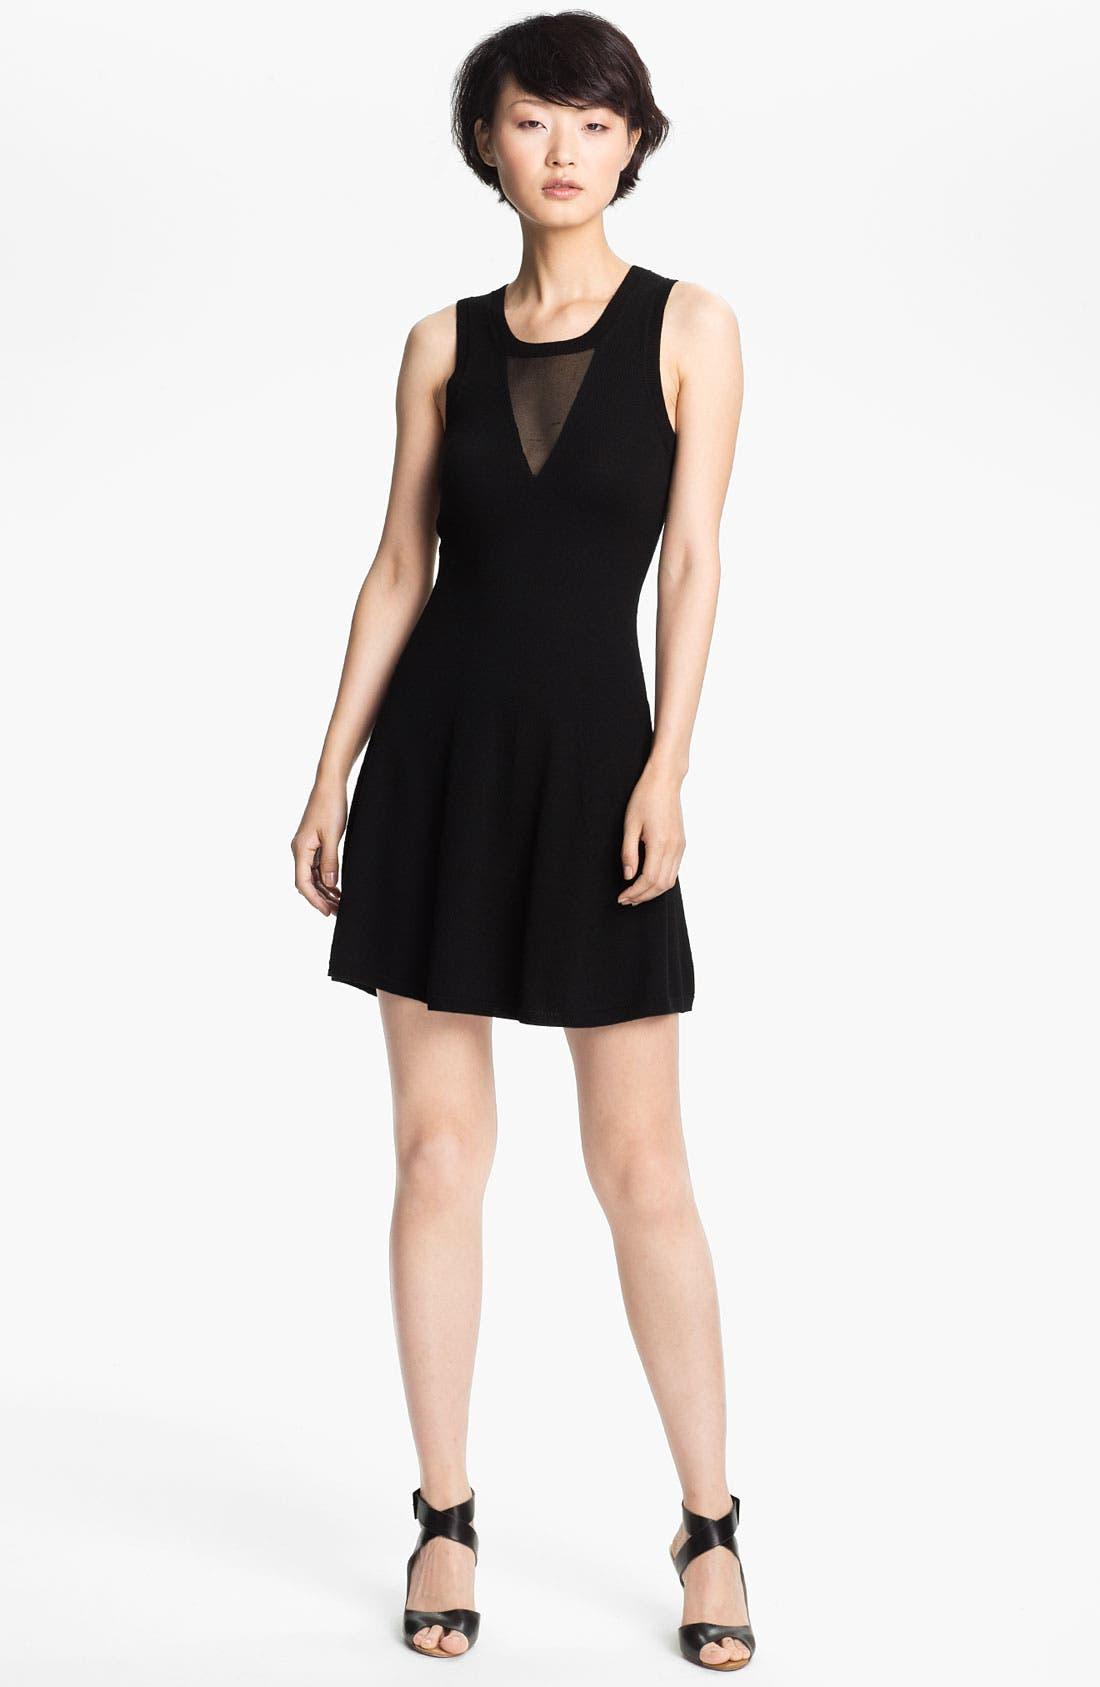 Alternate Image 1 Selected - 3.1 Phillip Lim Sheer Detail Knit Dress